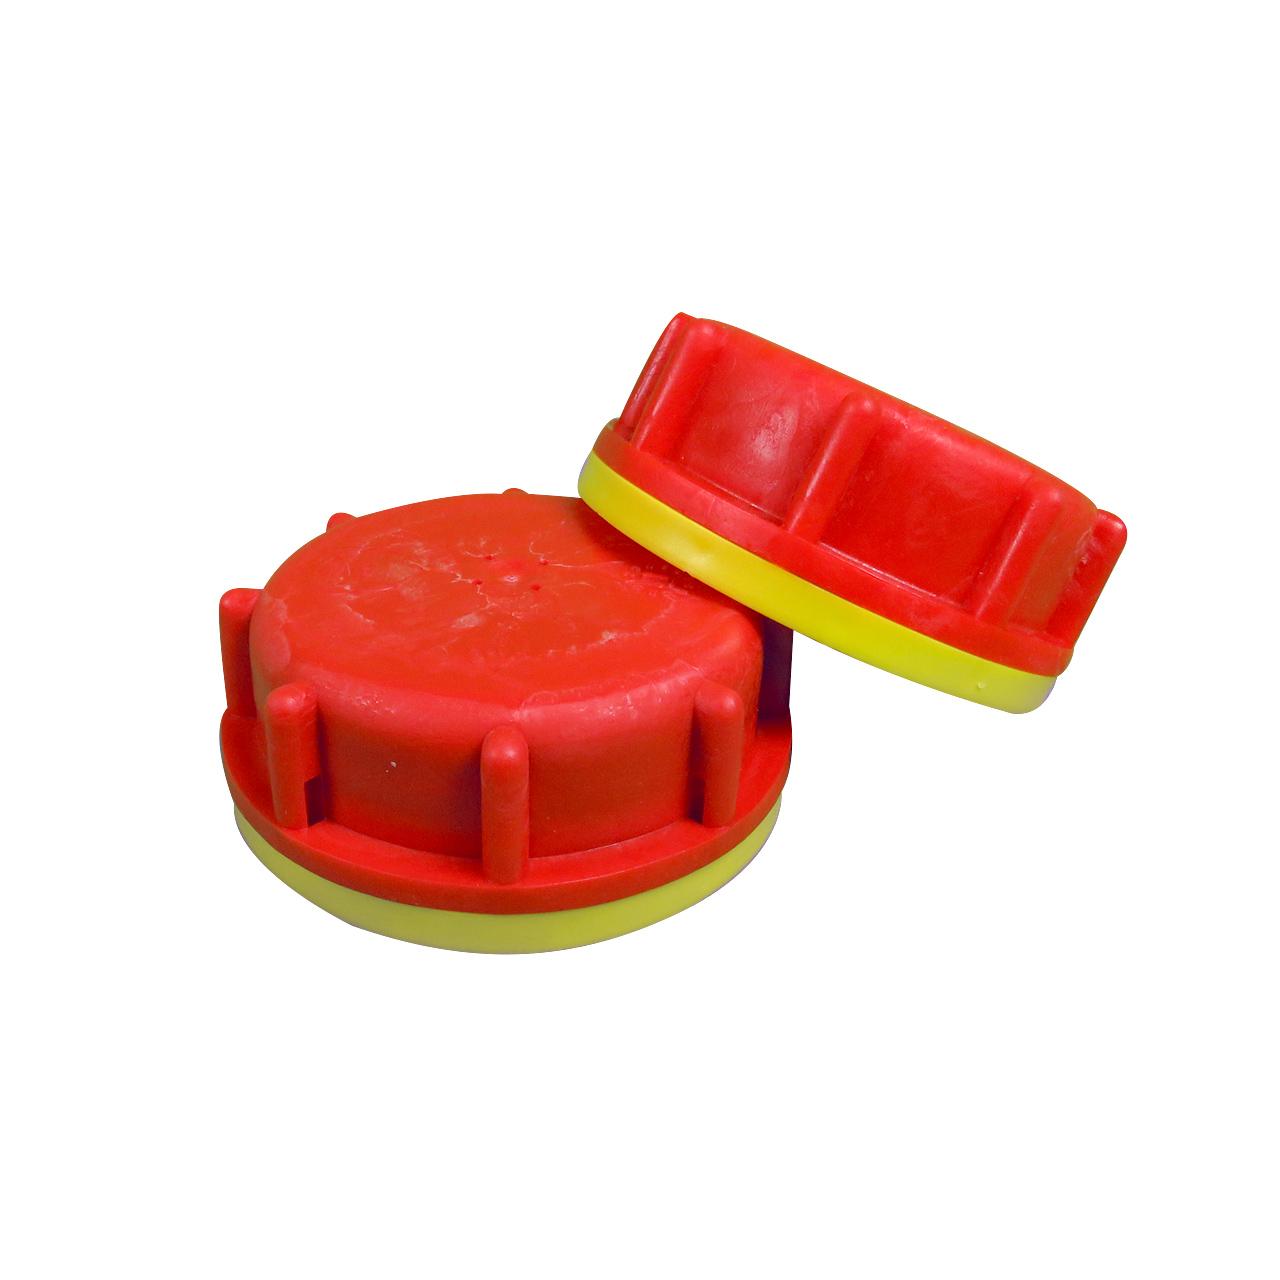 Kanisterverschluss OV61, Entgasung, rot, gelber Ring